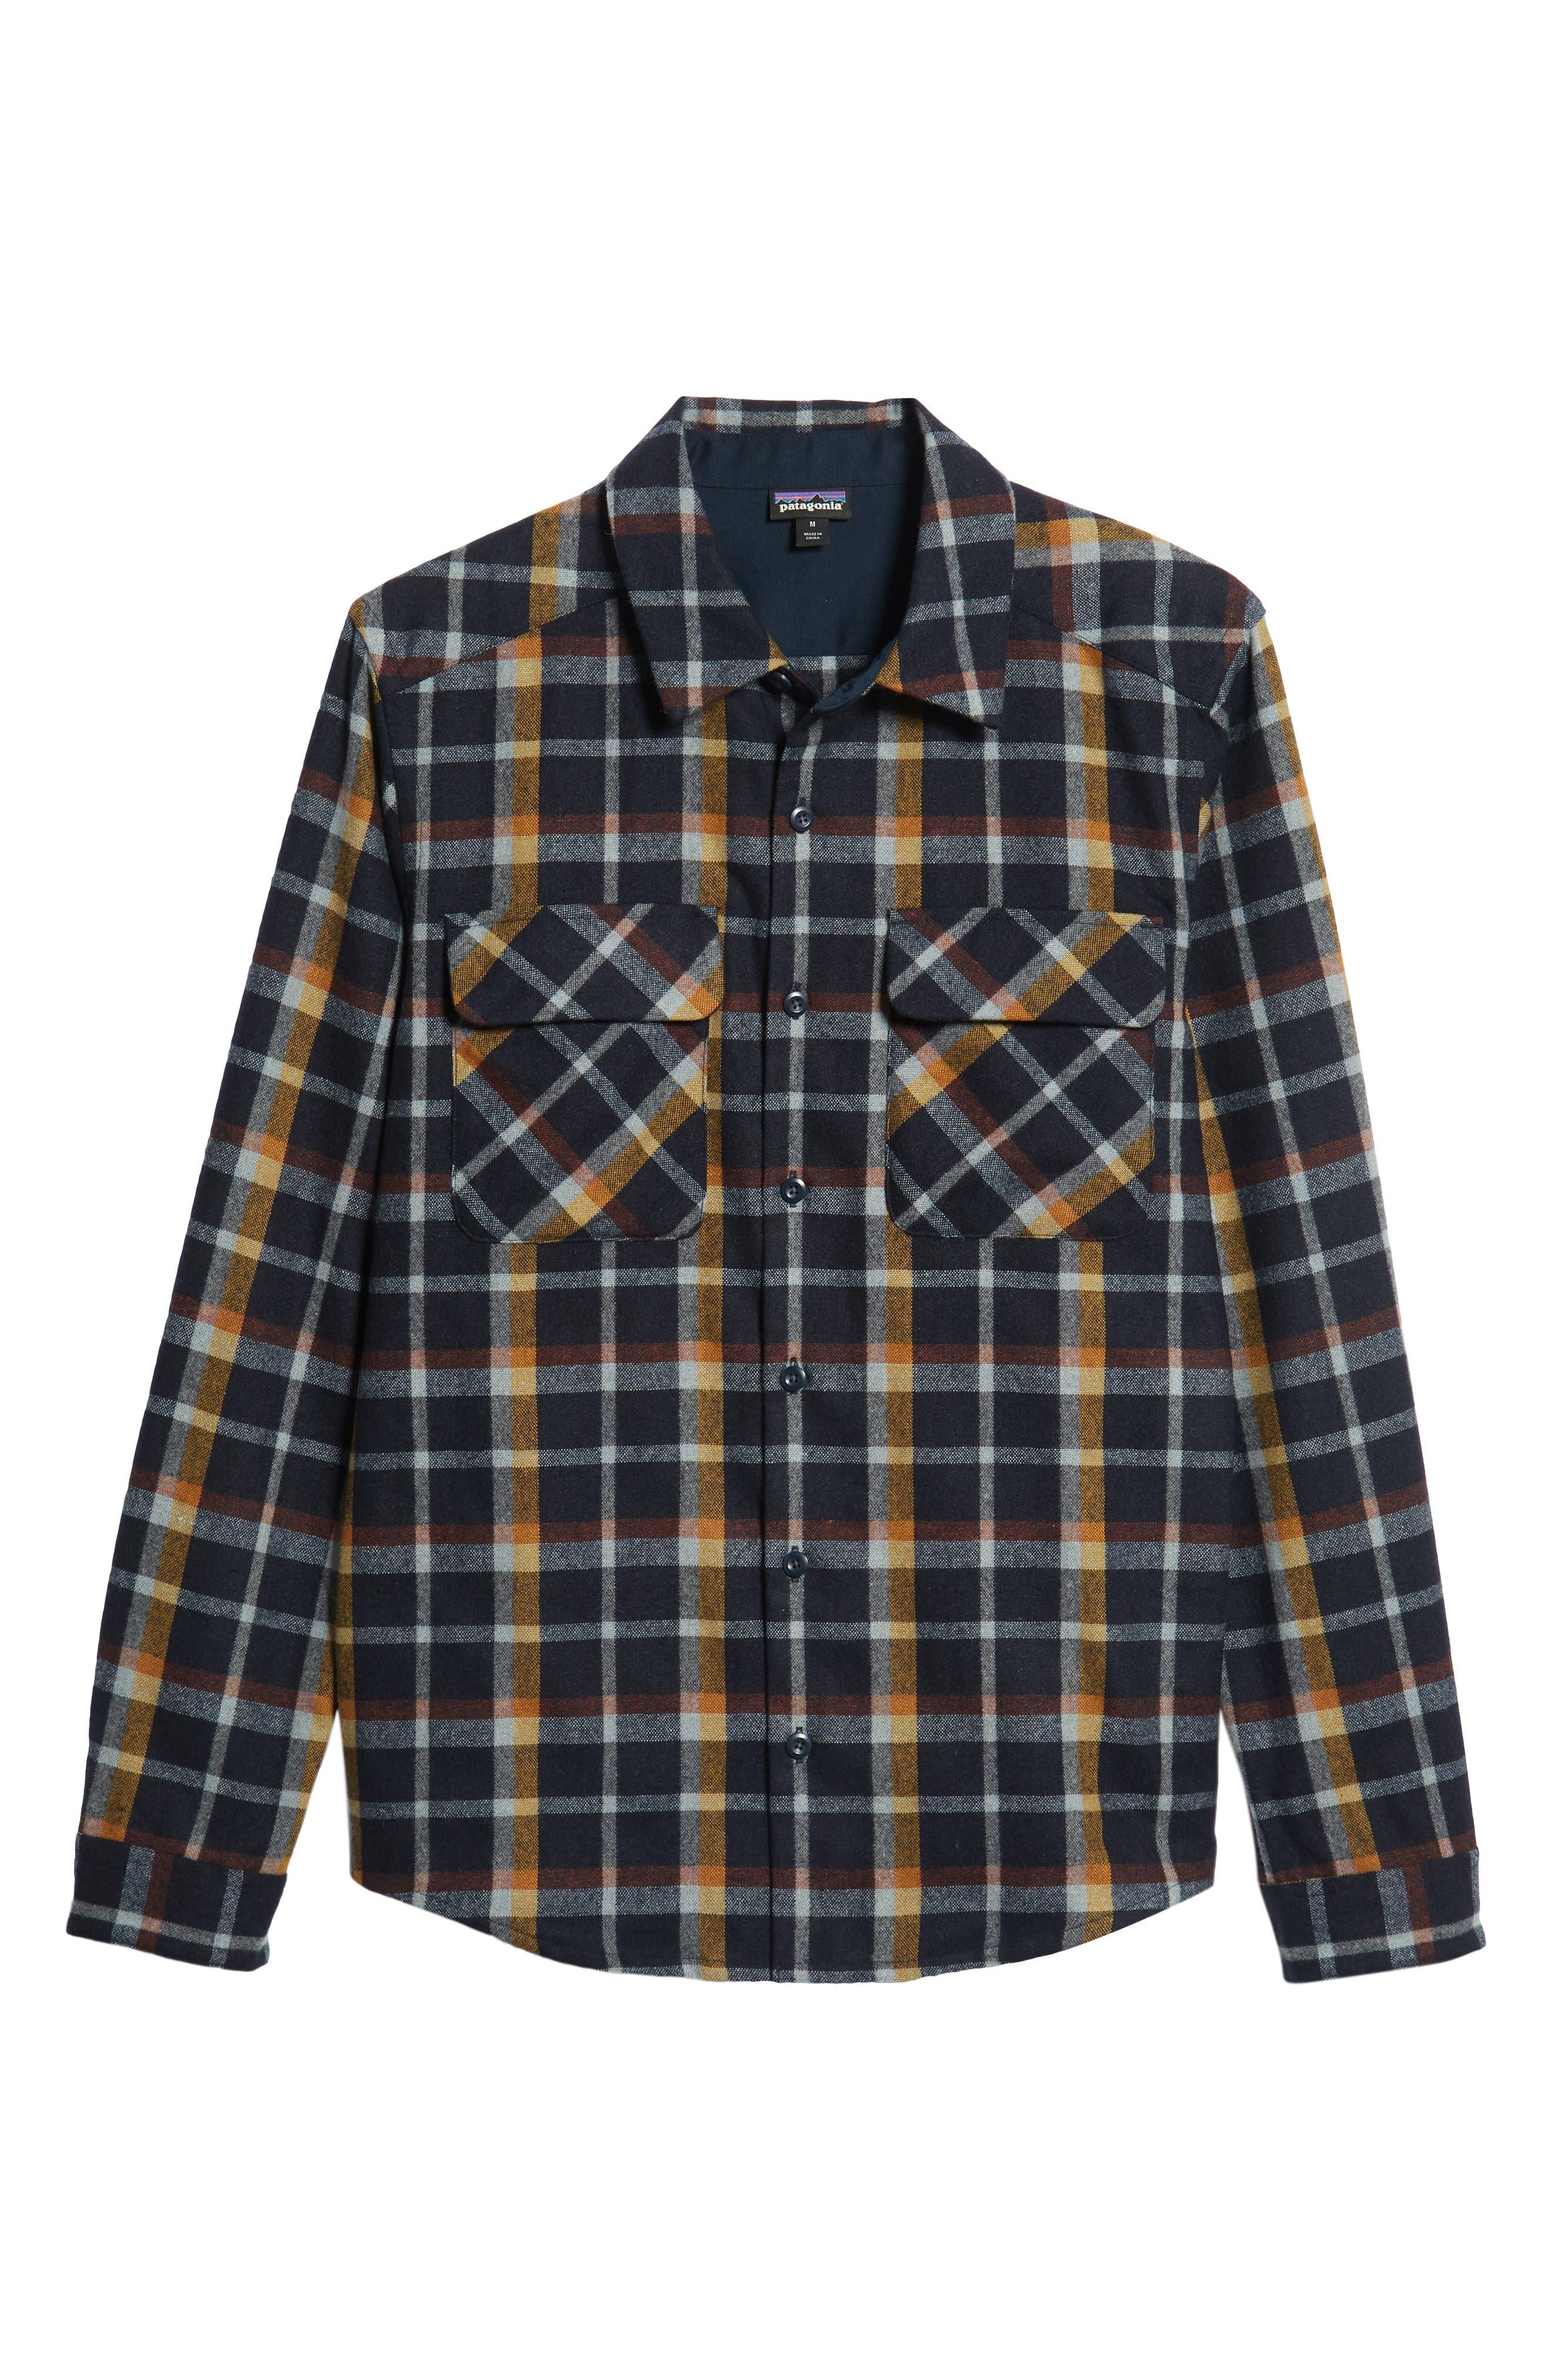 Recycled Wool Blend Shirt,                             Alternate thumbnail 5, color,                             REBEL PLAID/ NAVY BLUE